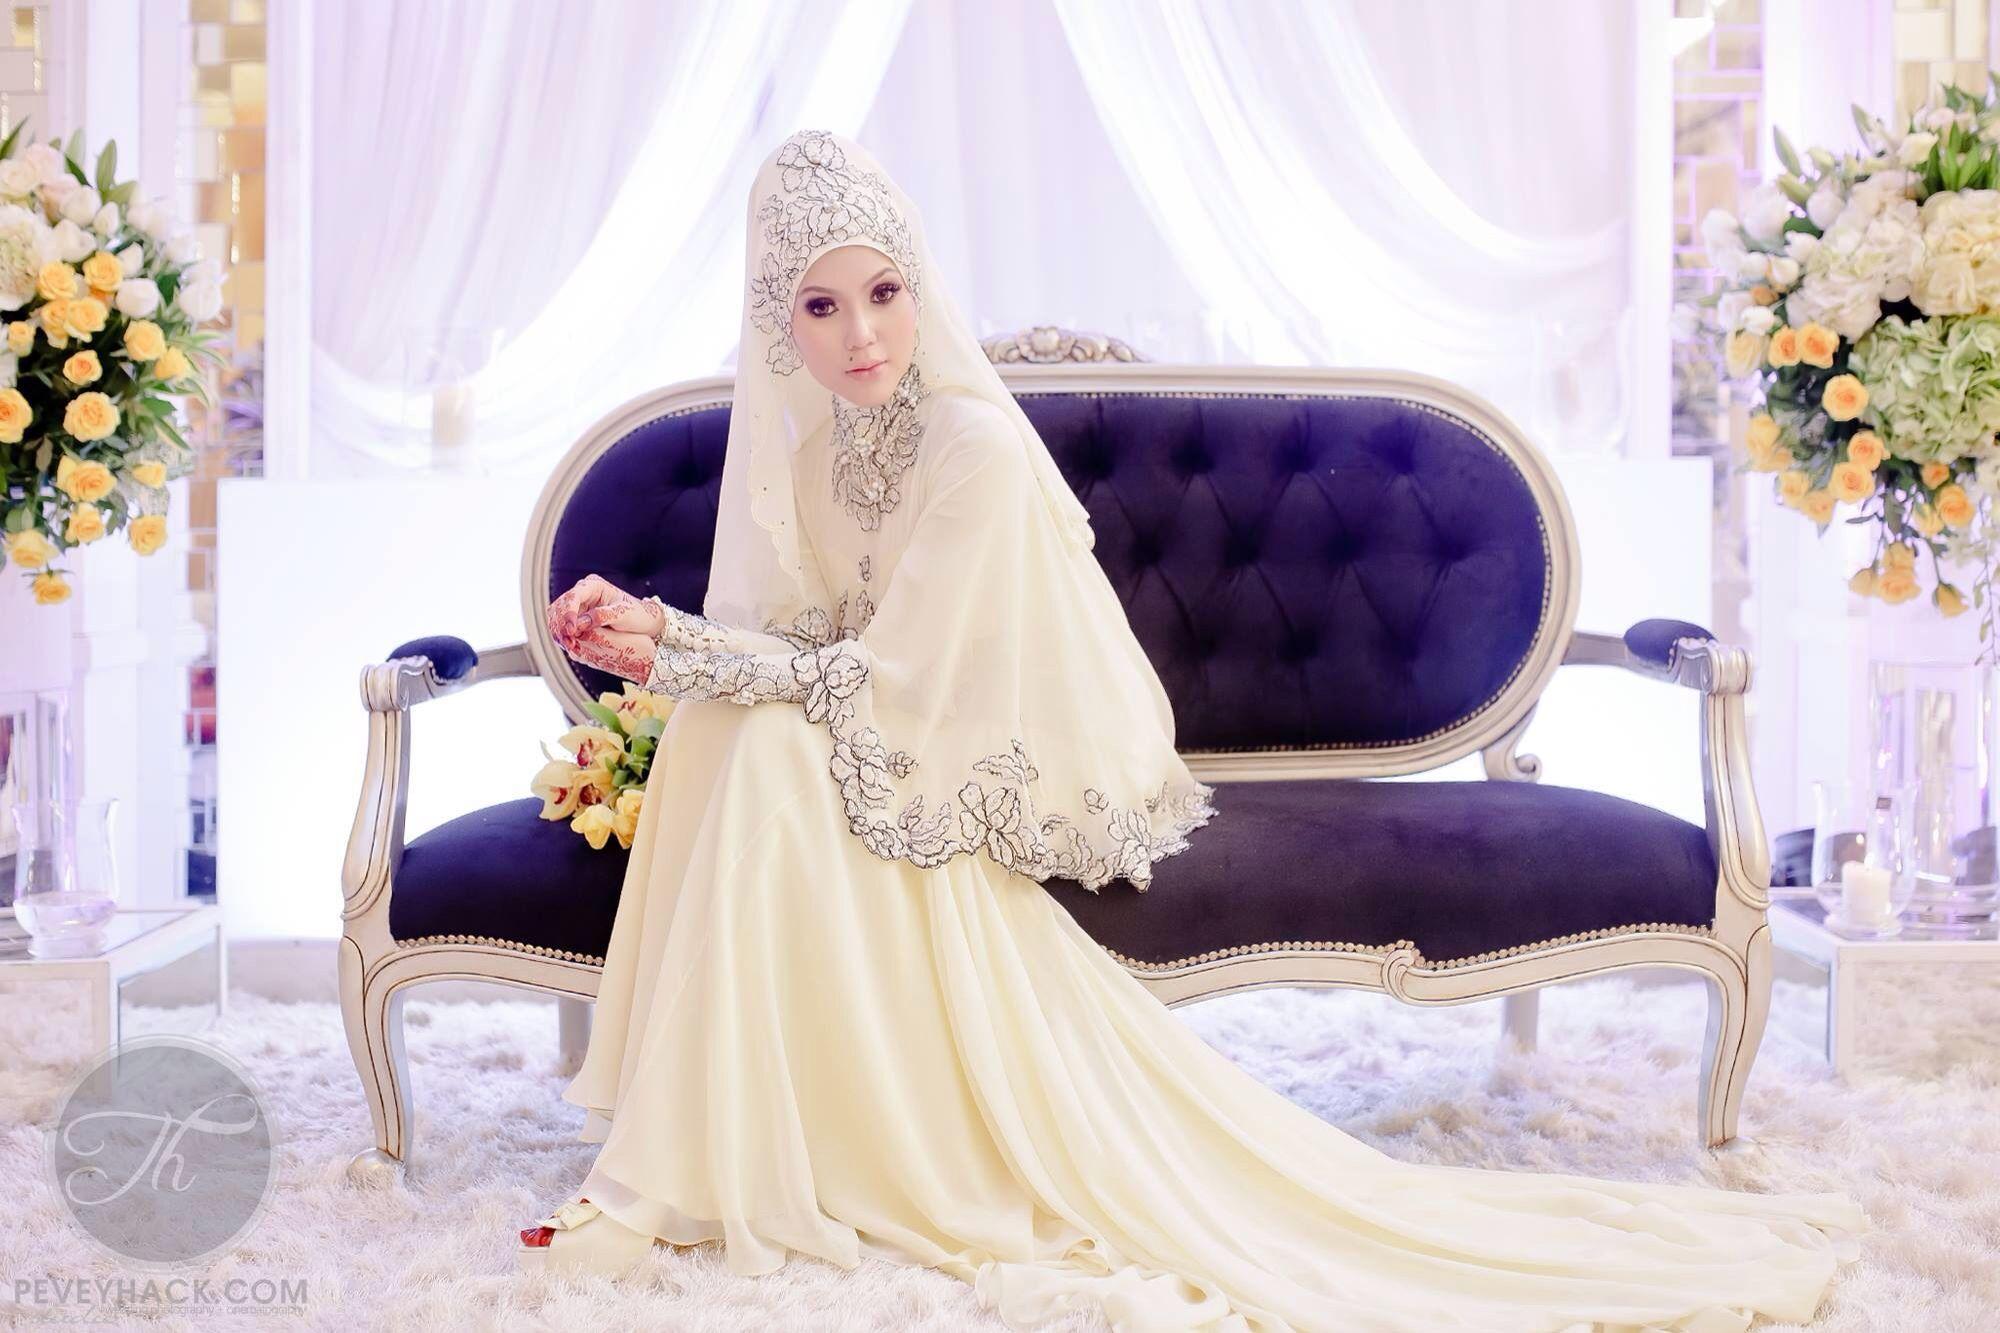 Pin By Anizat On Yourhermywedding Loose Wedding Dress Muslim Wedding Dresses Muslimah Wedding